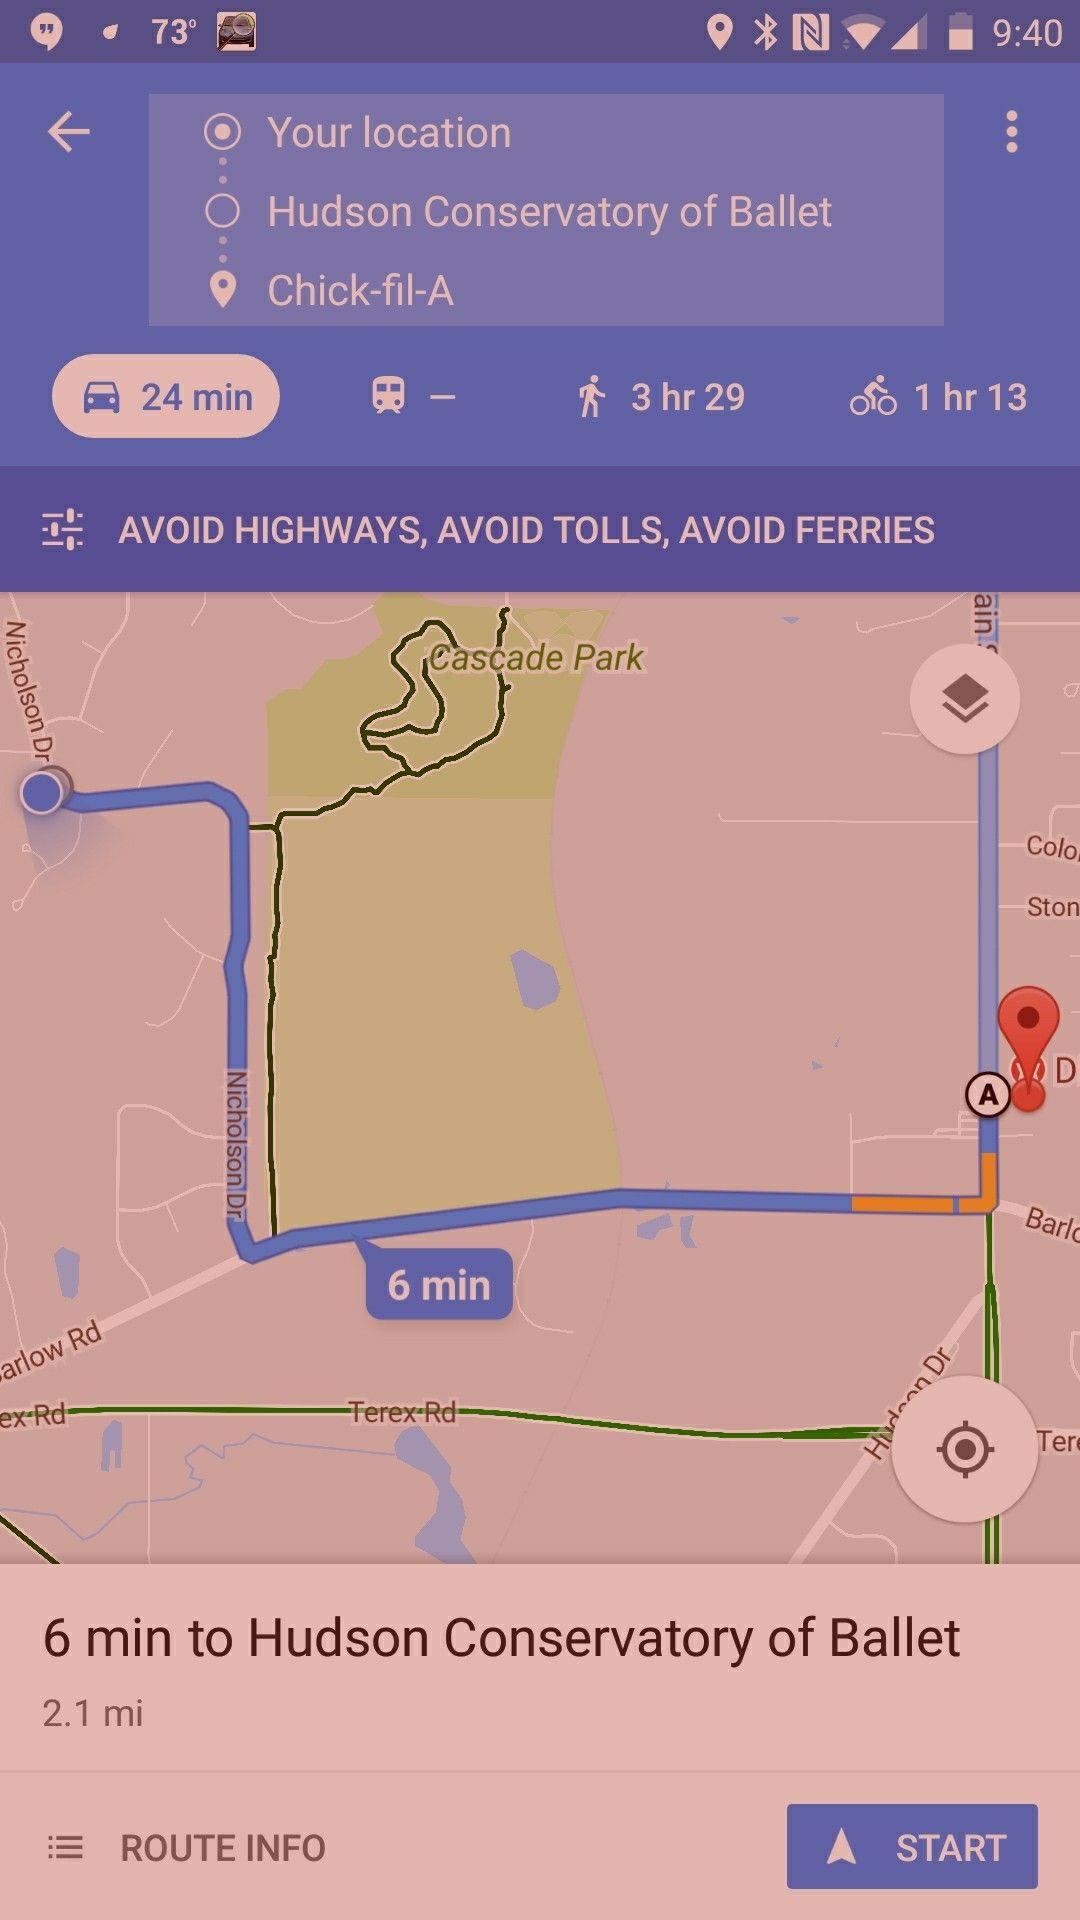 888dd02836b134a48bf1d0c747b883d2 - How Do I Get Google Maps To Avoid Toll Roads